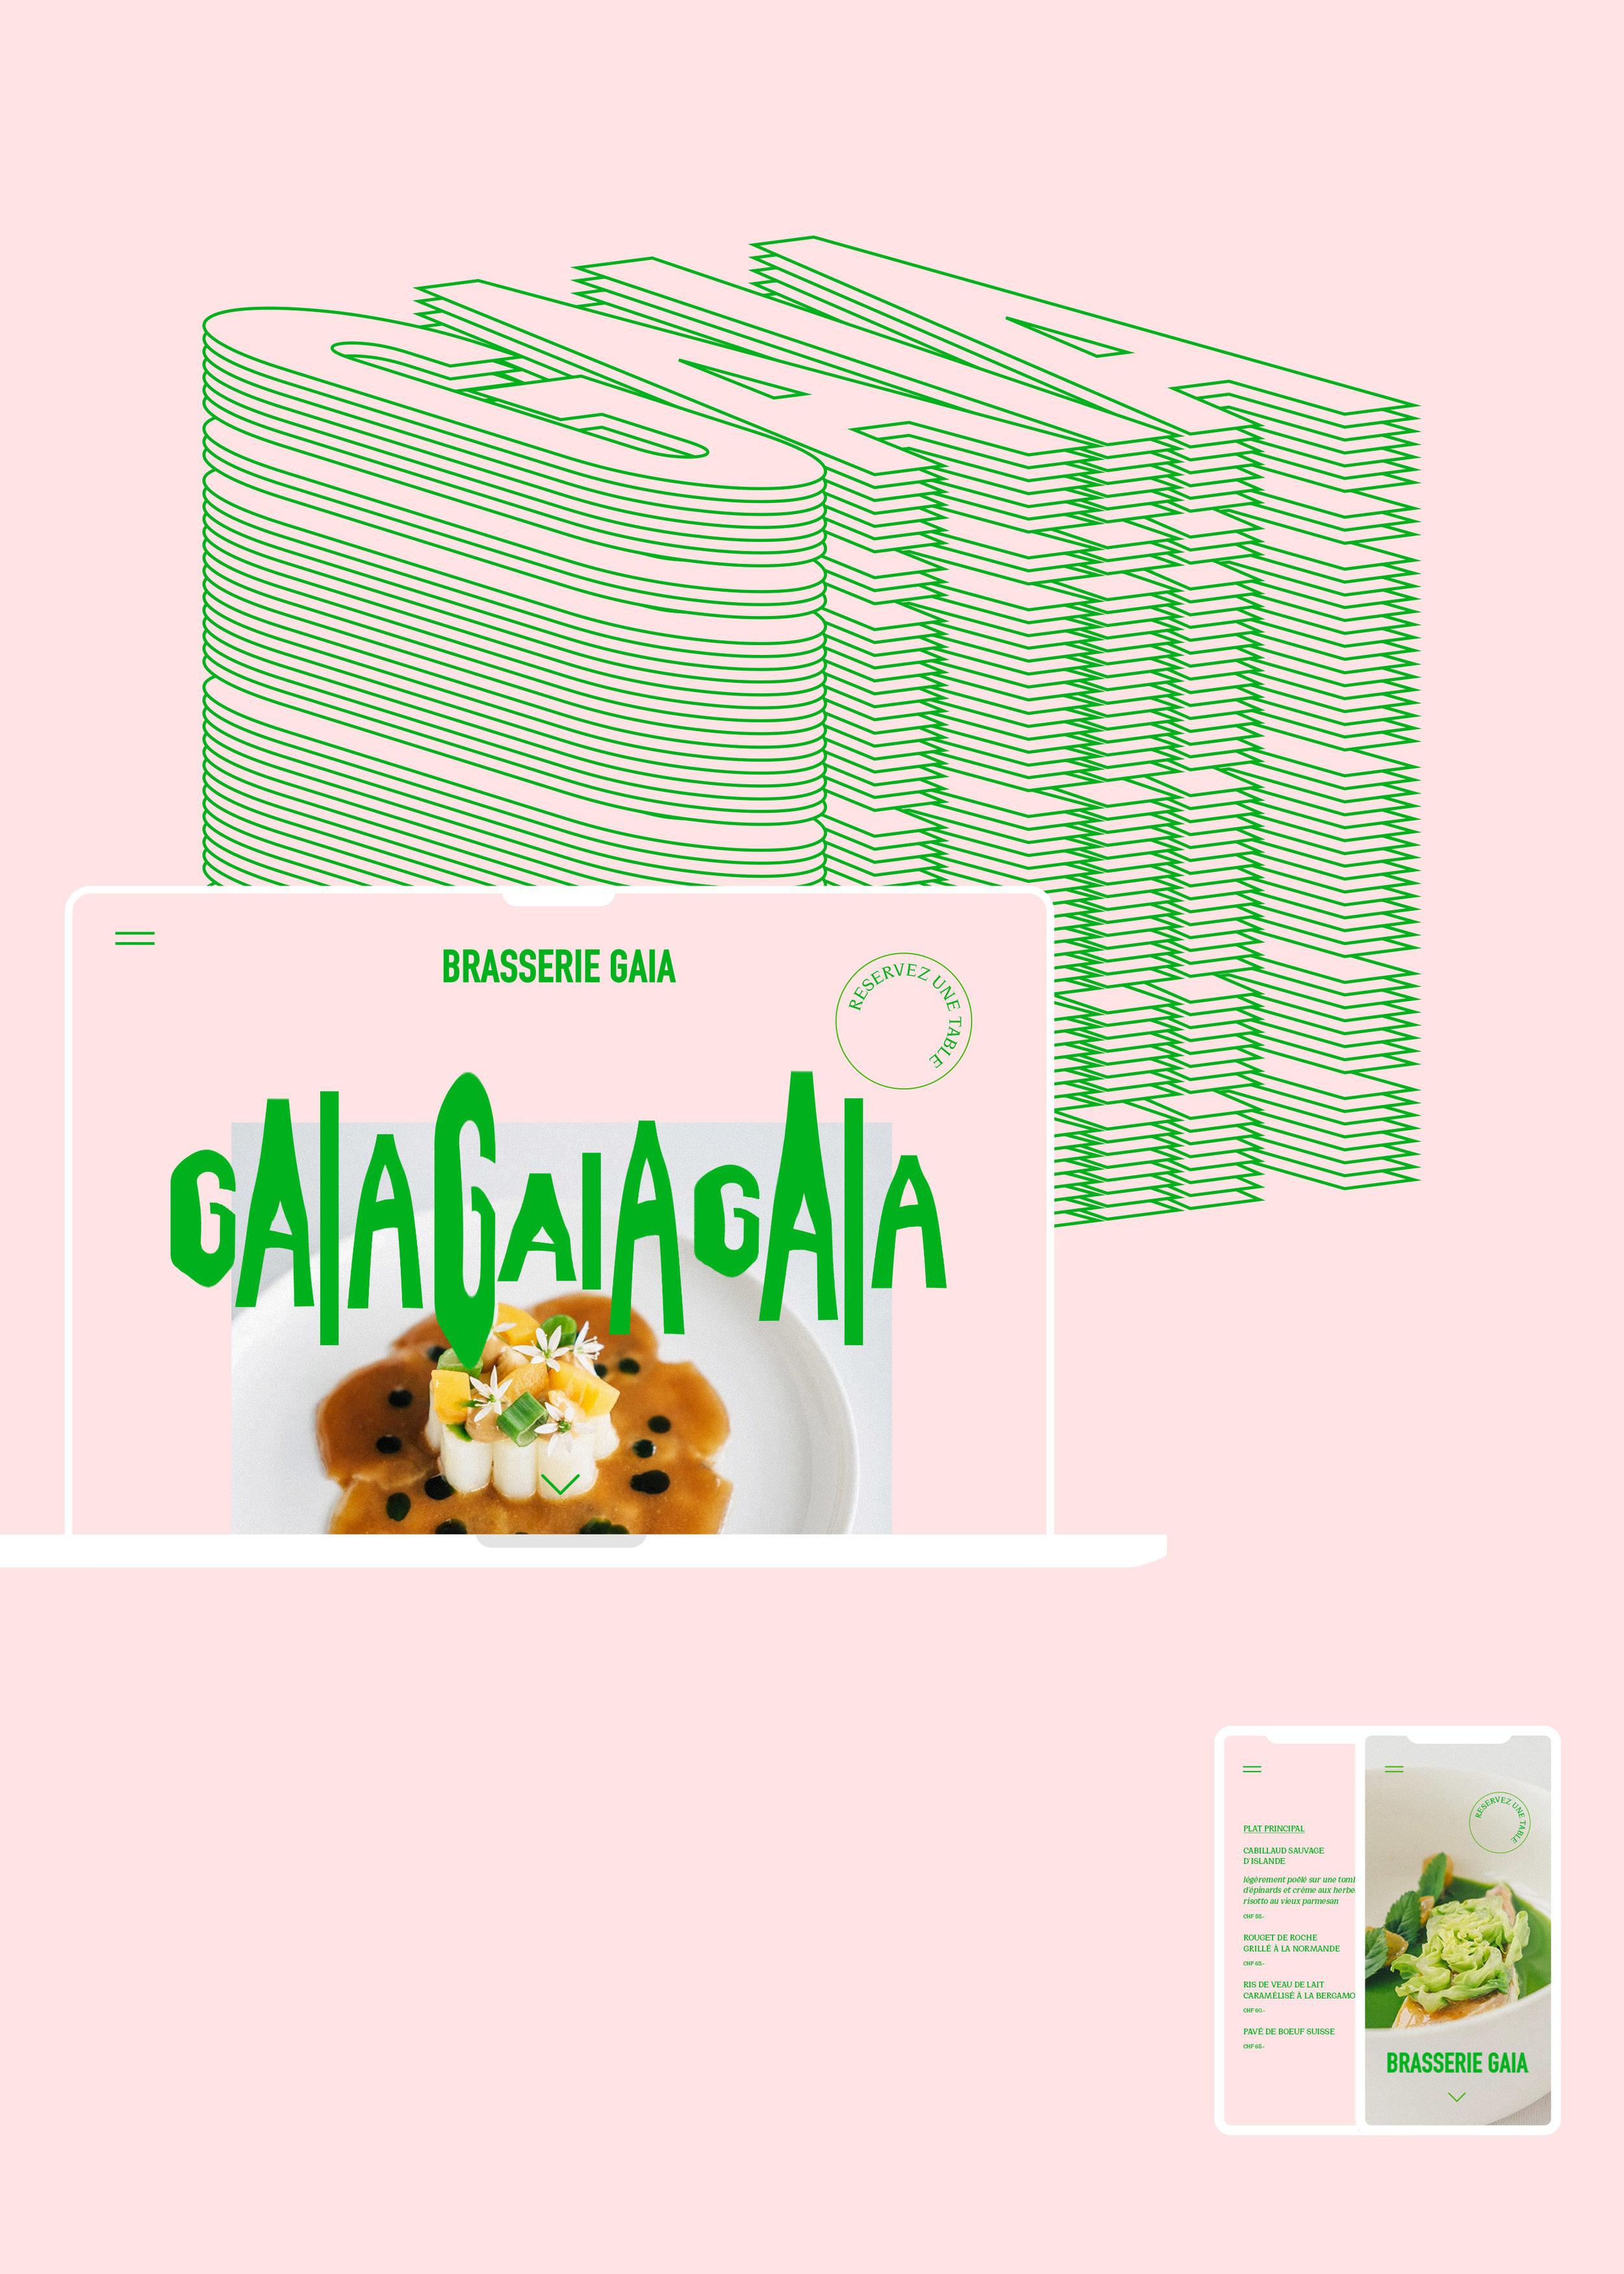 sleepless_creative_gaia_web_2.jpg